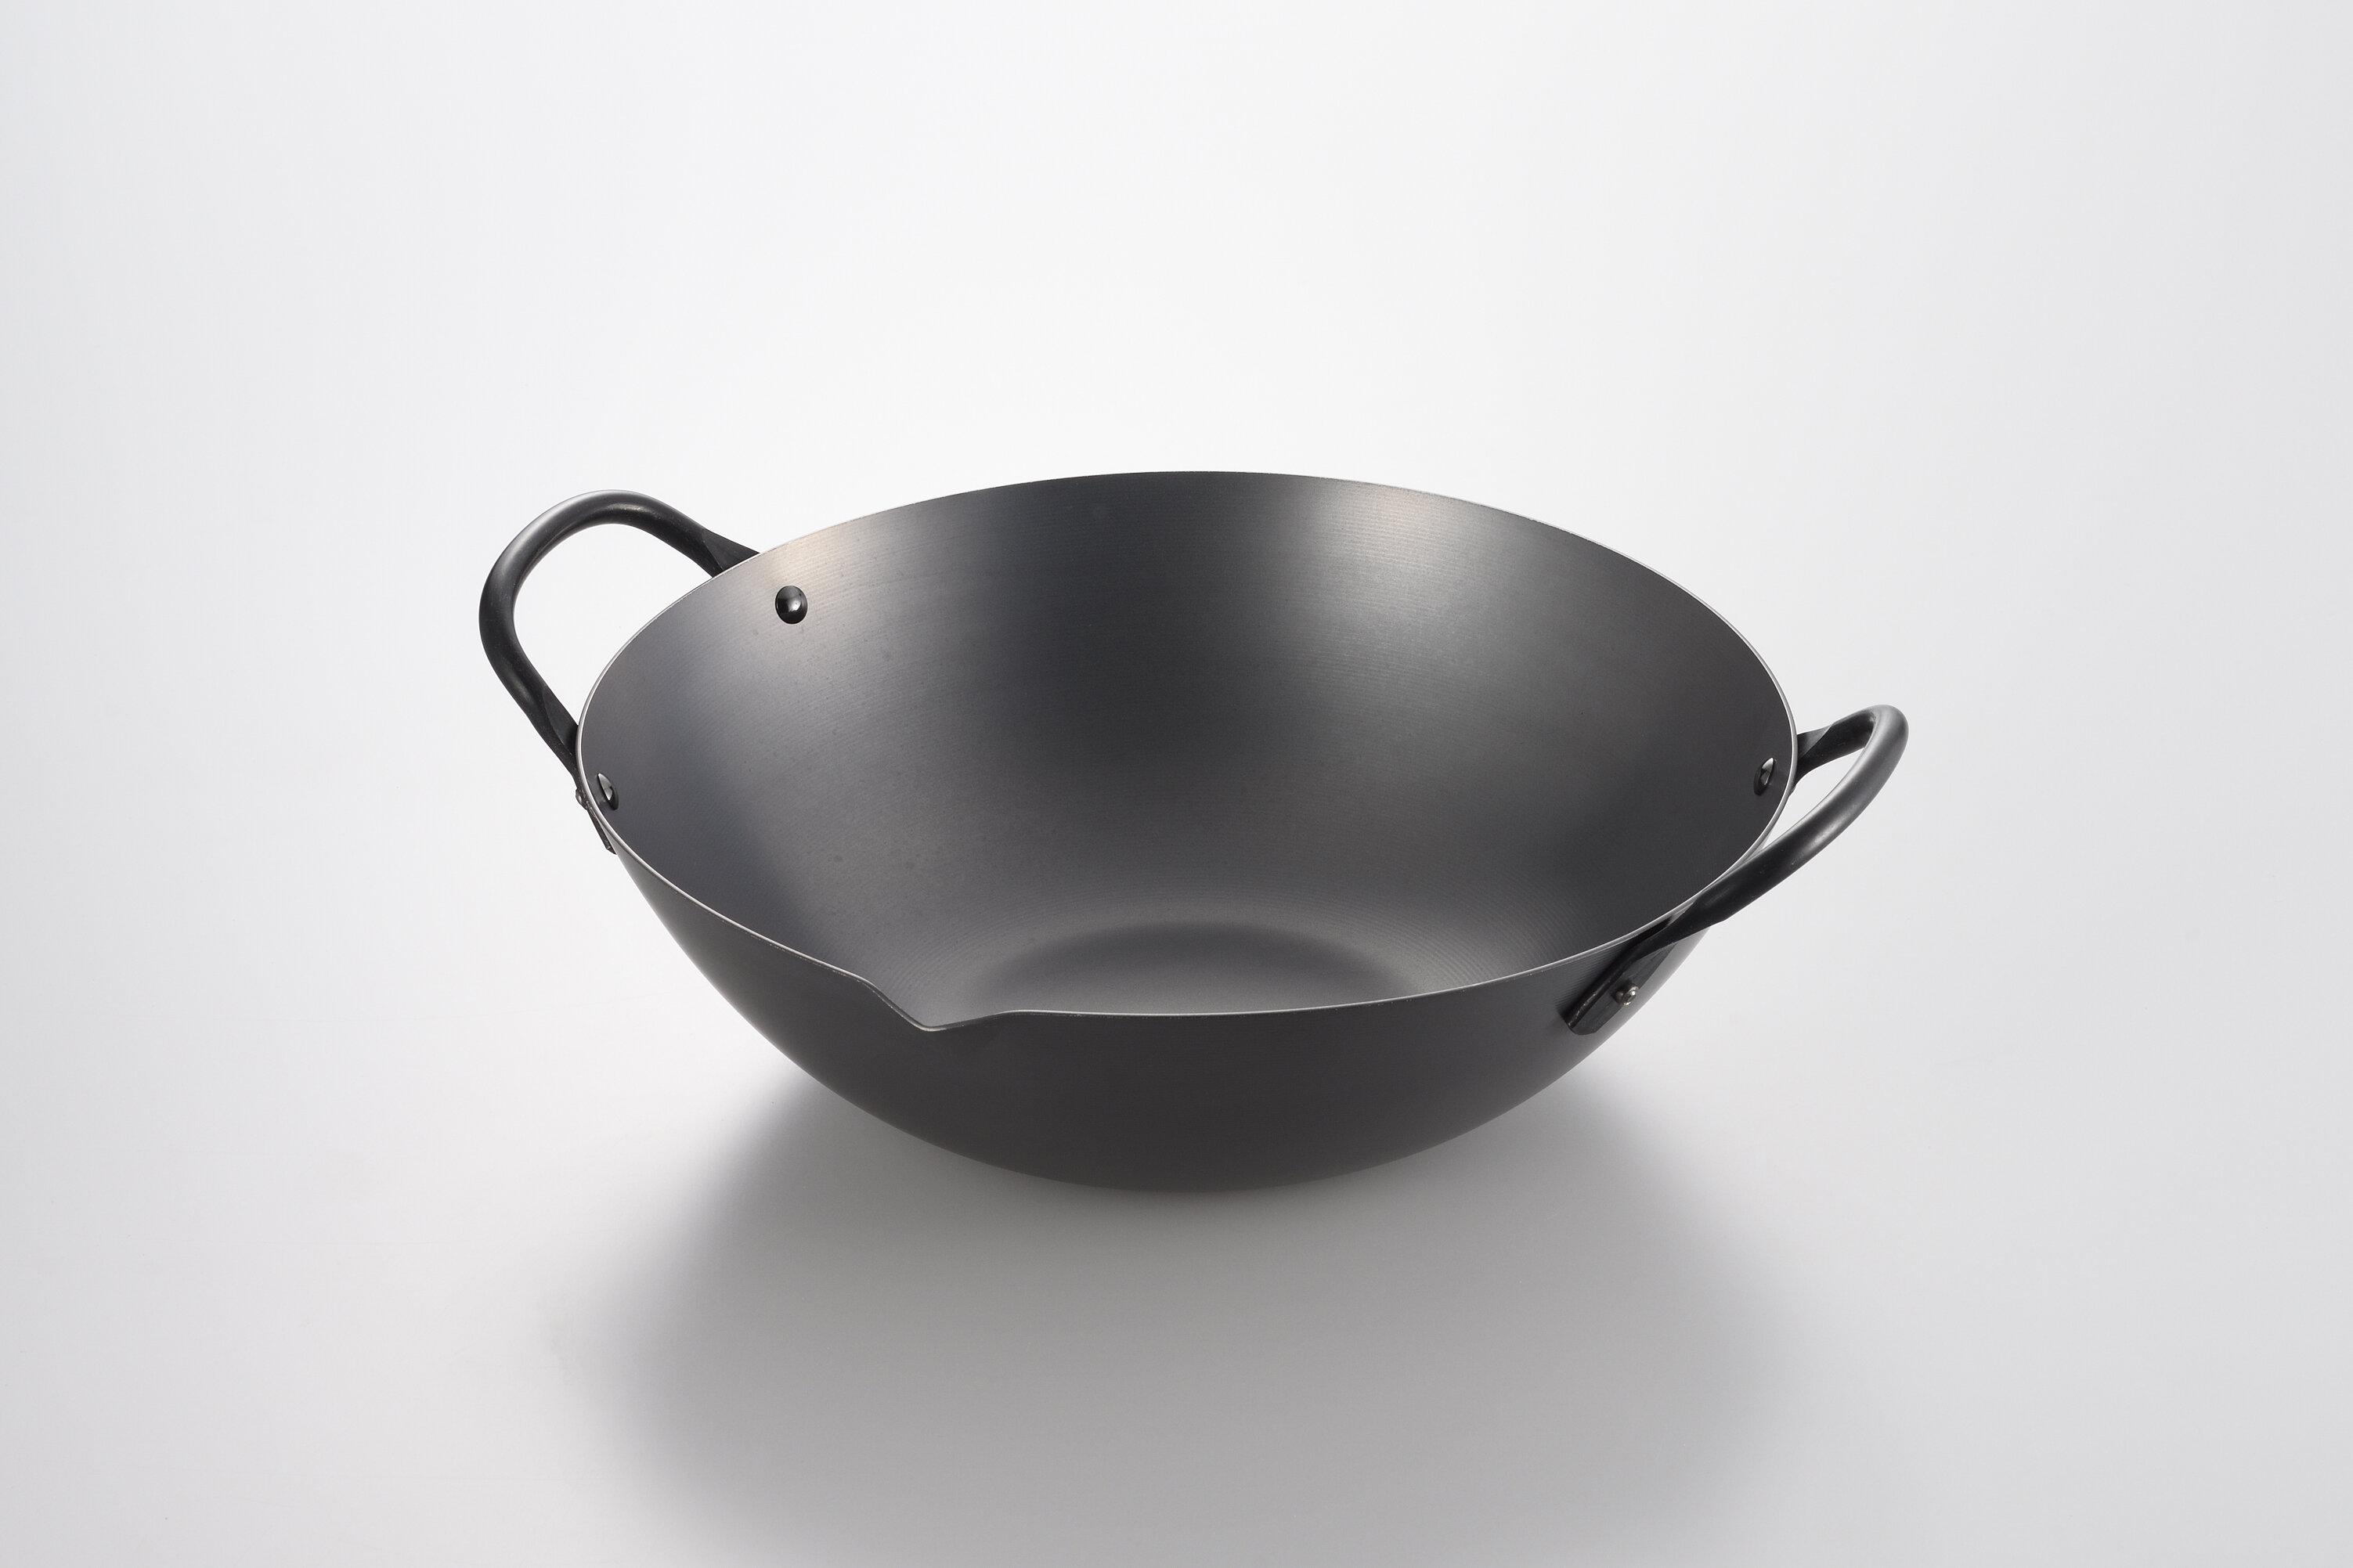 Yoshikawa Cookware Canton Non Stick Carbon Steel Wok Wayfair